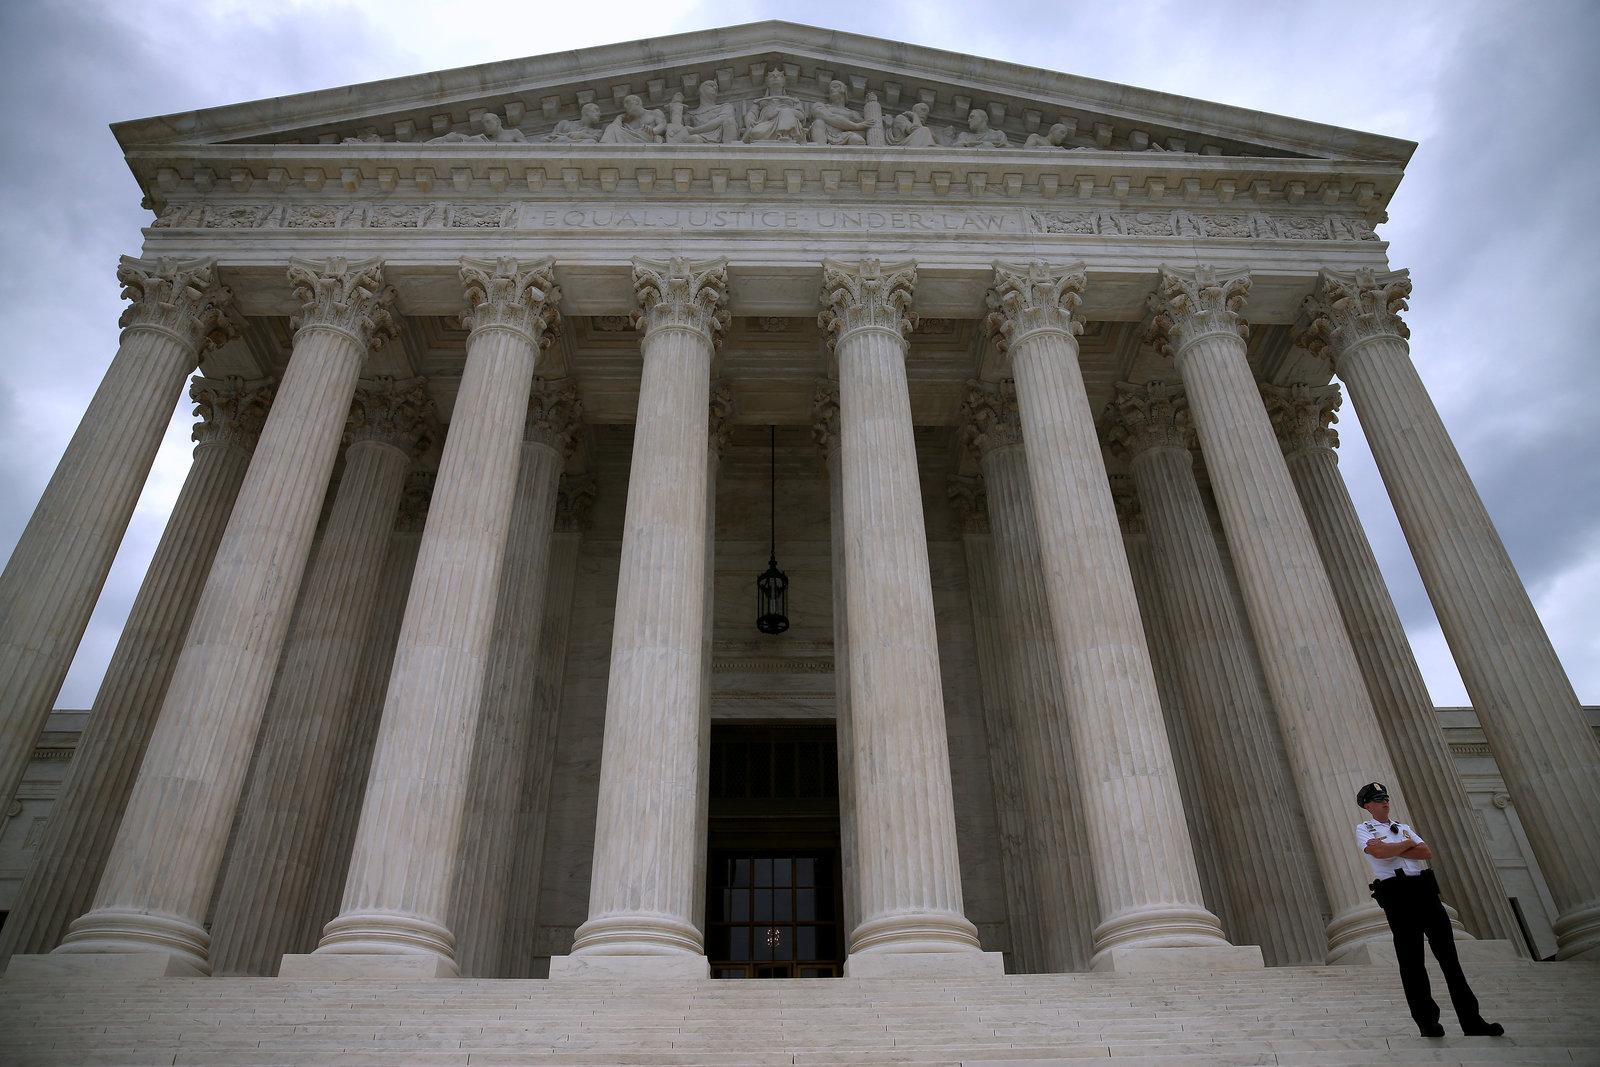 U.S. Supreme Court Building in Washington, D.C. Credit: Mark Wilson/Getty Images